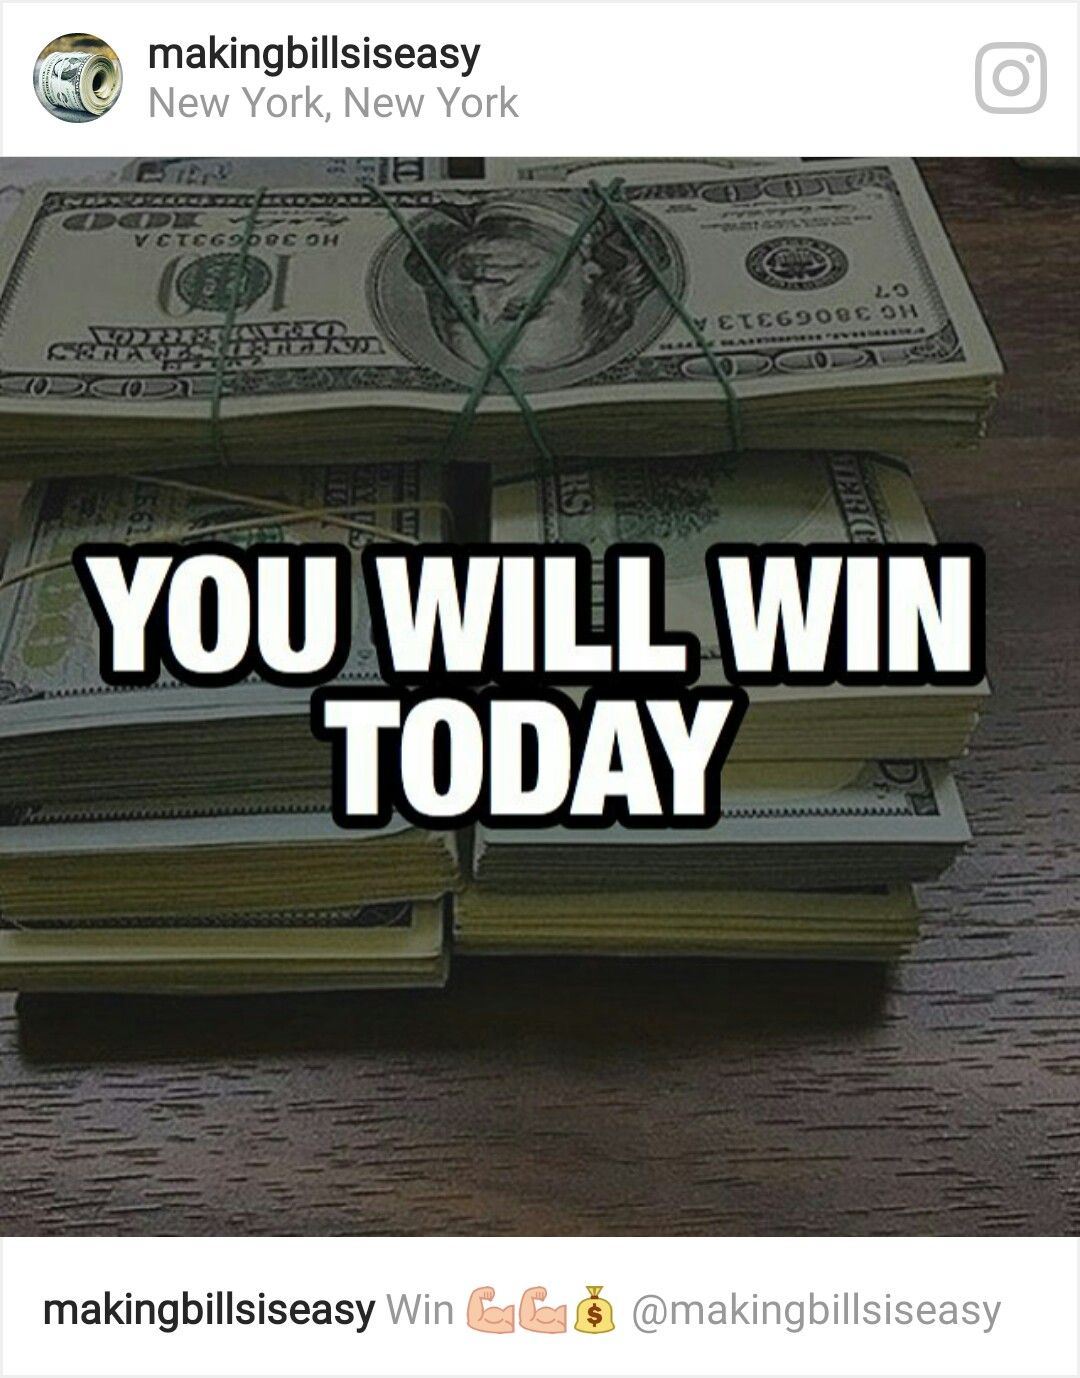 YES‼ I LENDA VL AM THE AUGUST 2017 LOTTO JACKPOT WINNER‼ 000 4 3 13 7 11:11 22 THANK YOU UNIVERSE I AM INFINITELY GRATEFUL‼8/19/17